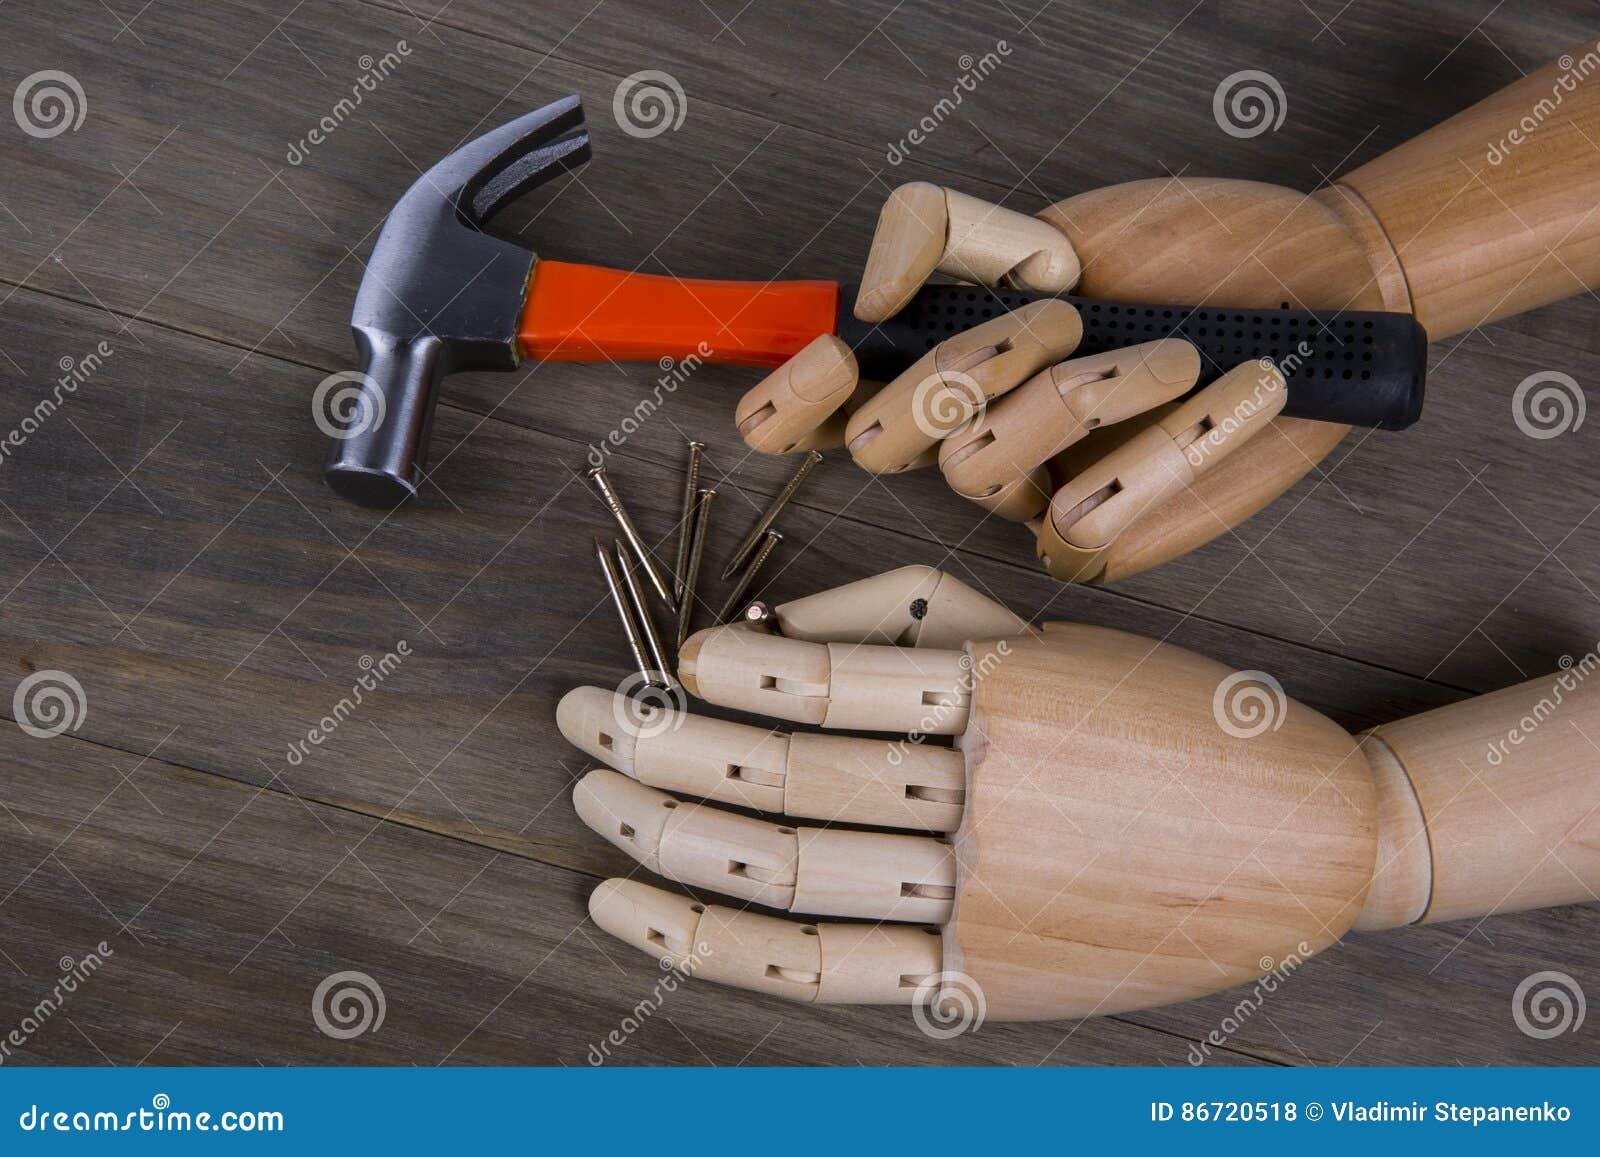 Рука держит молоток